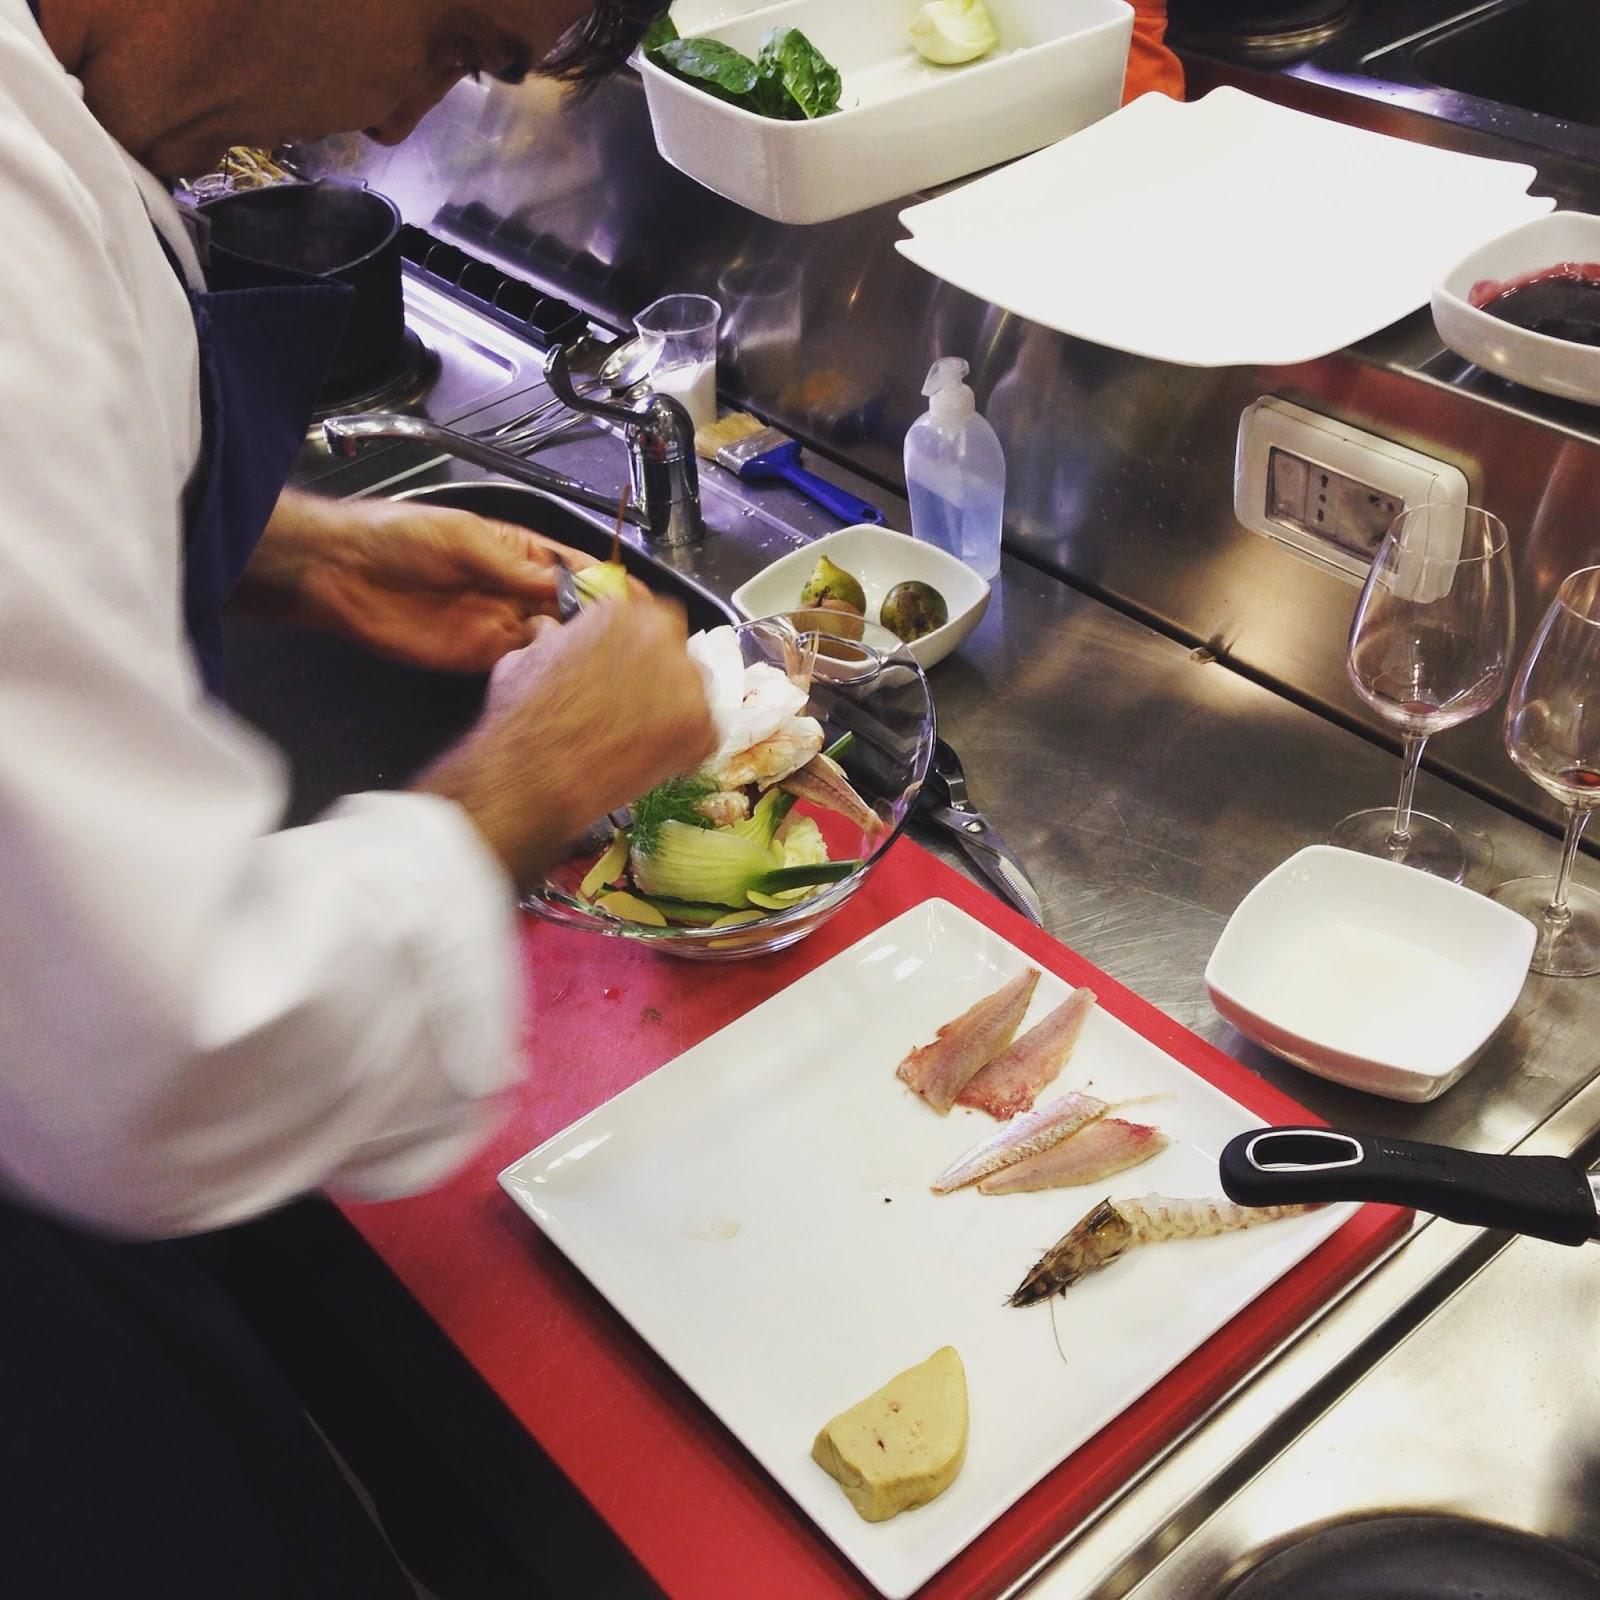 Inthekitchentour 2015 a casa artusi ziggy in the kitchen - Osteria con cucina francesco angelini ...